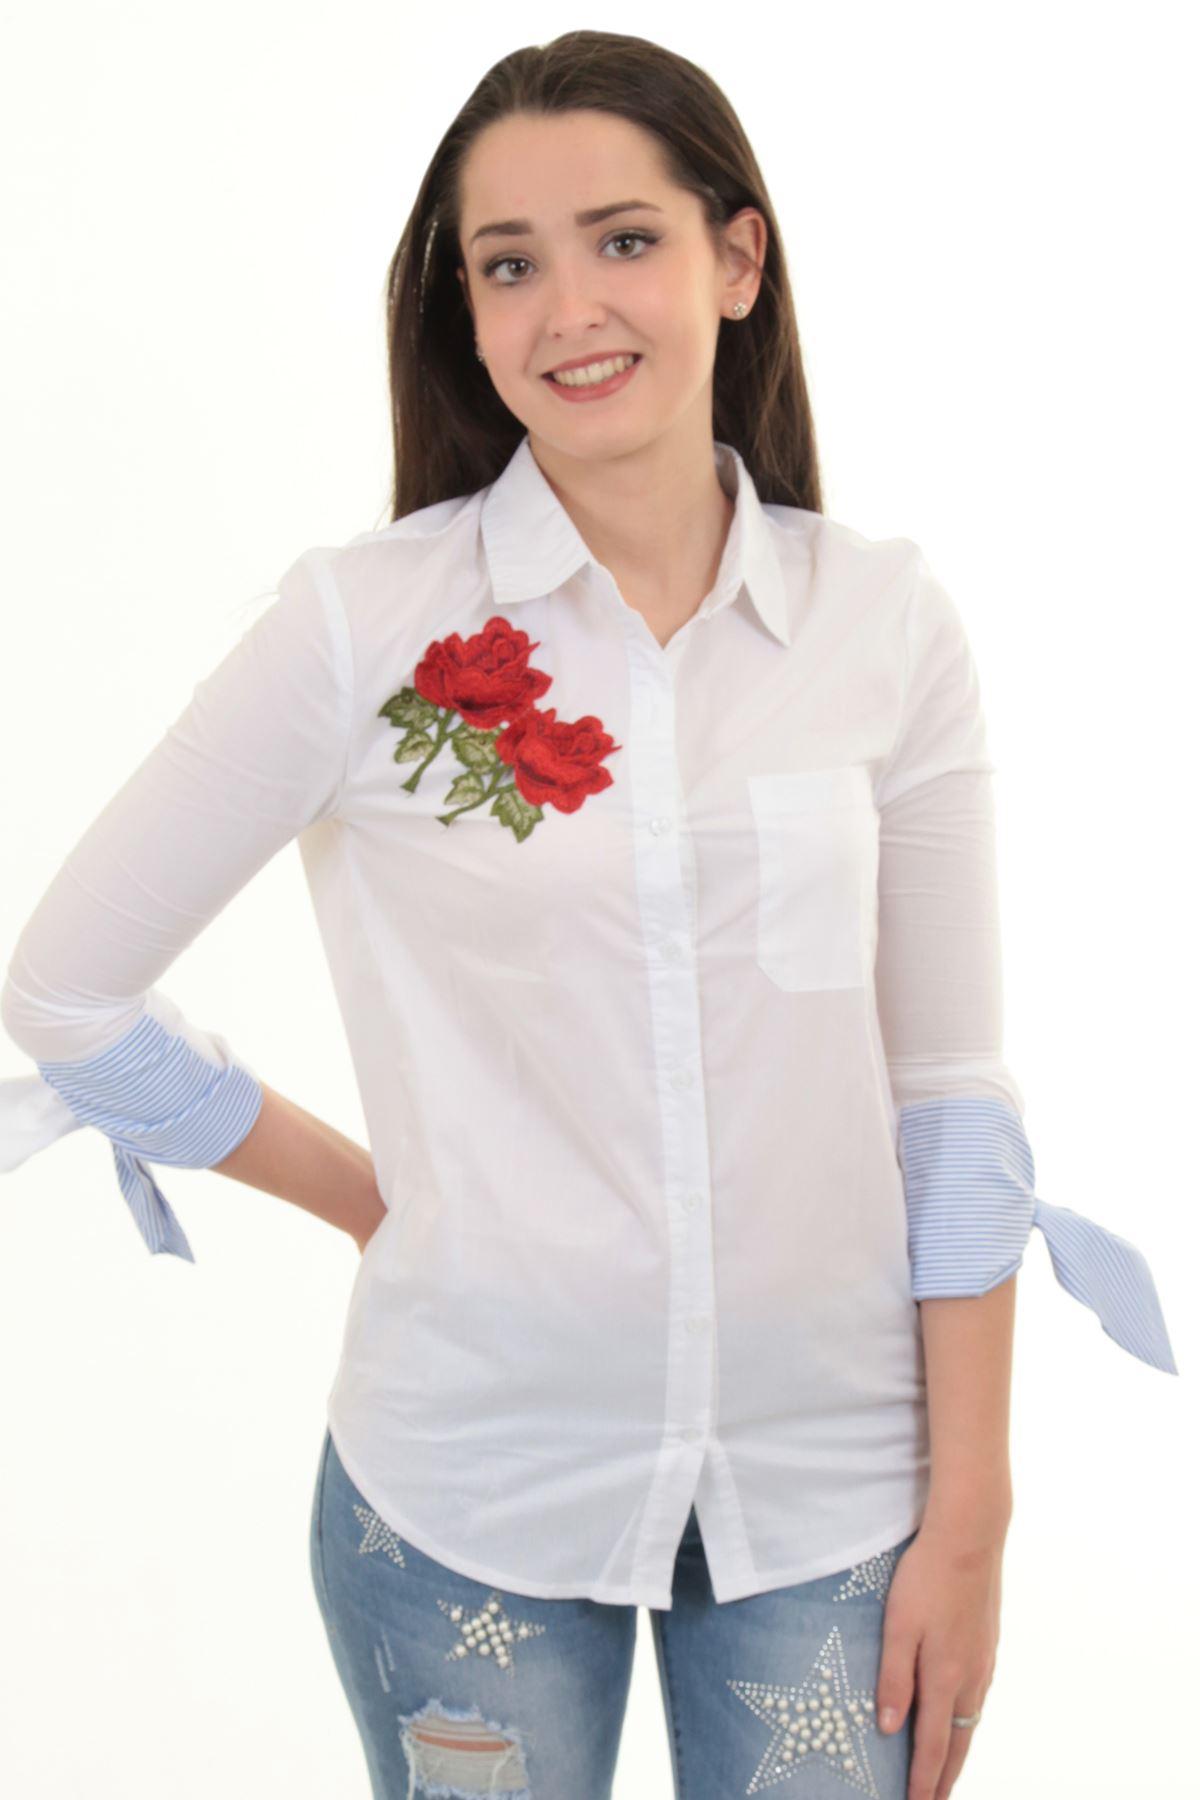 632b228048 Rosa Floral para mujer bordada 3/4 vuelta hasta nudo manga alta baja camisa  blusa